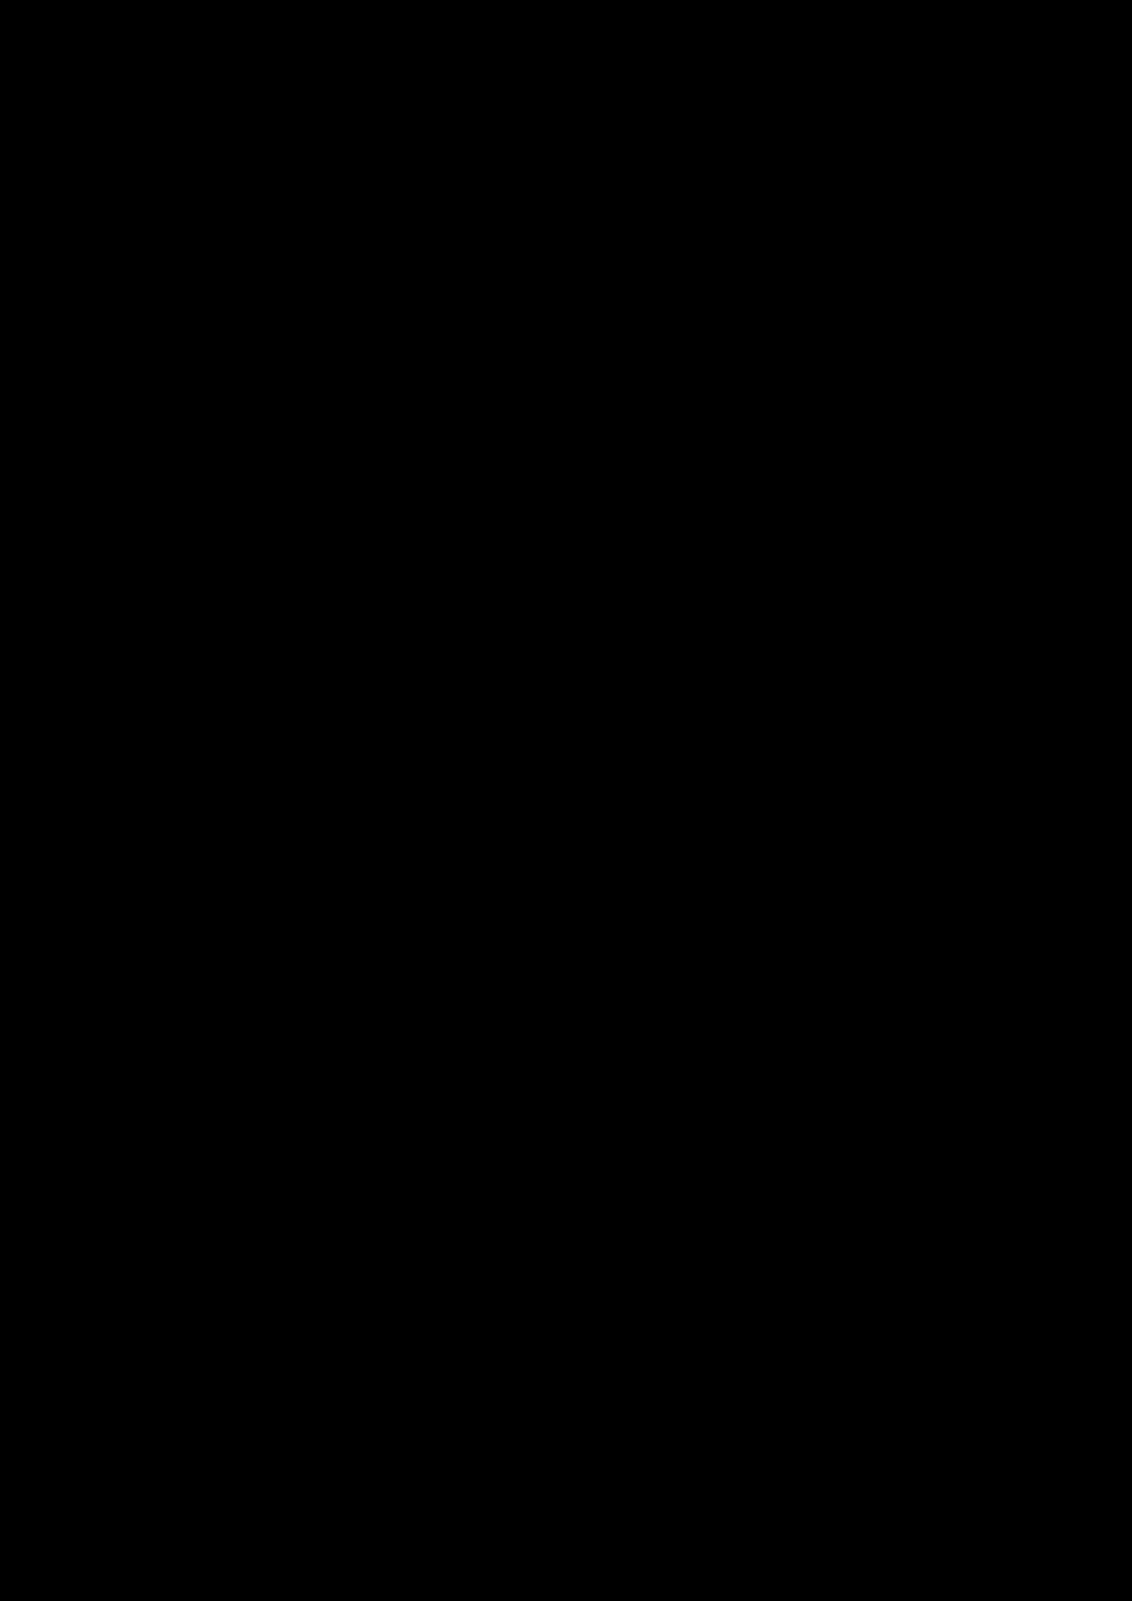 Belyiy sokol slide, Image 10